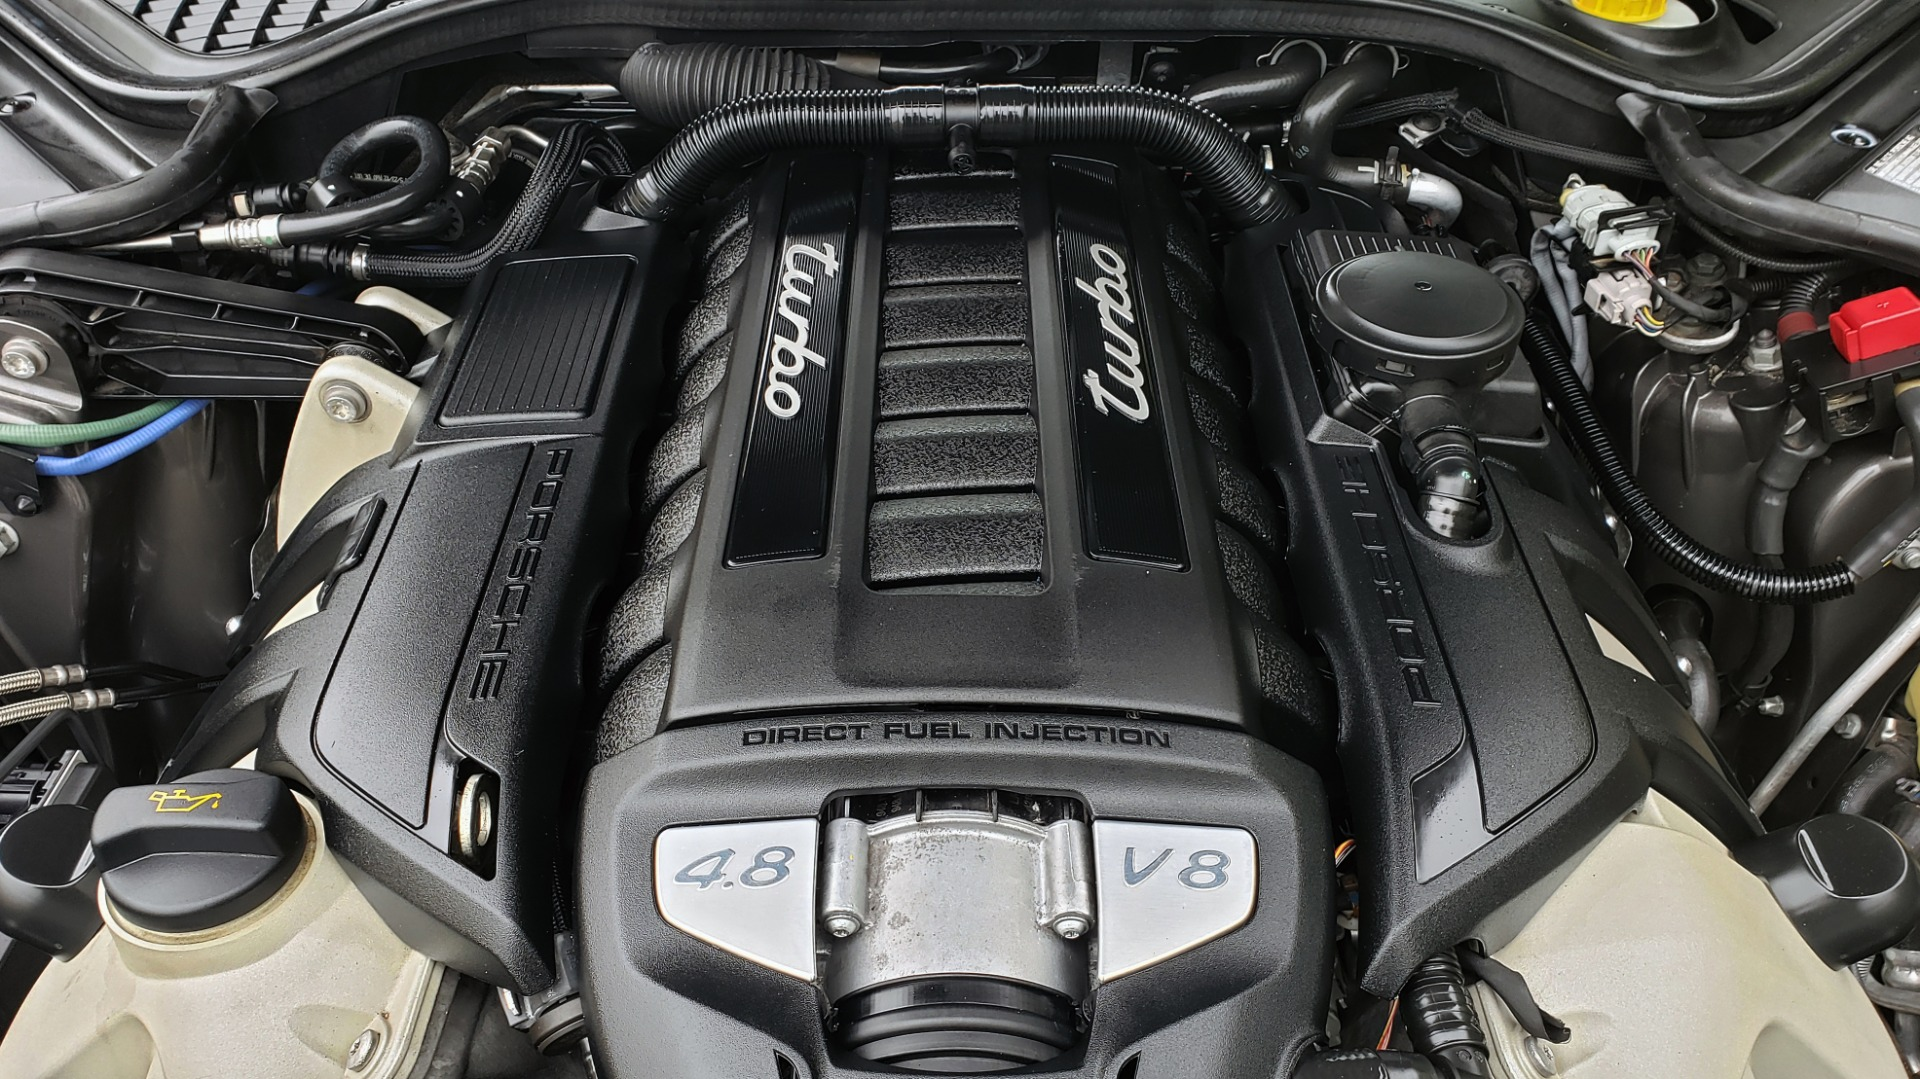 Used 2013 Porsche PANAMERA TURBO 4.8L V8 / AWD / NAV / SUNROOF / LCA / PARK ASST / BURMESTER for sale $45,995 at Formula Imports in Charlotte NC 28227 12